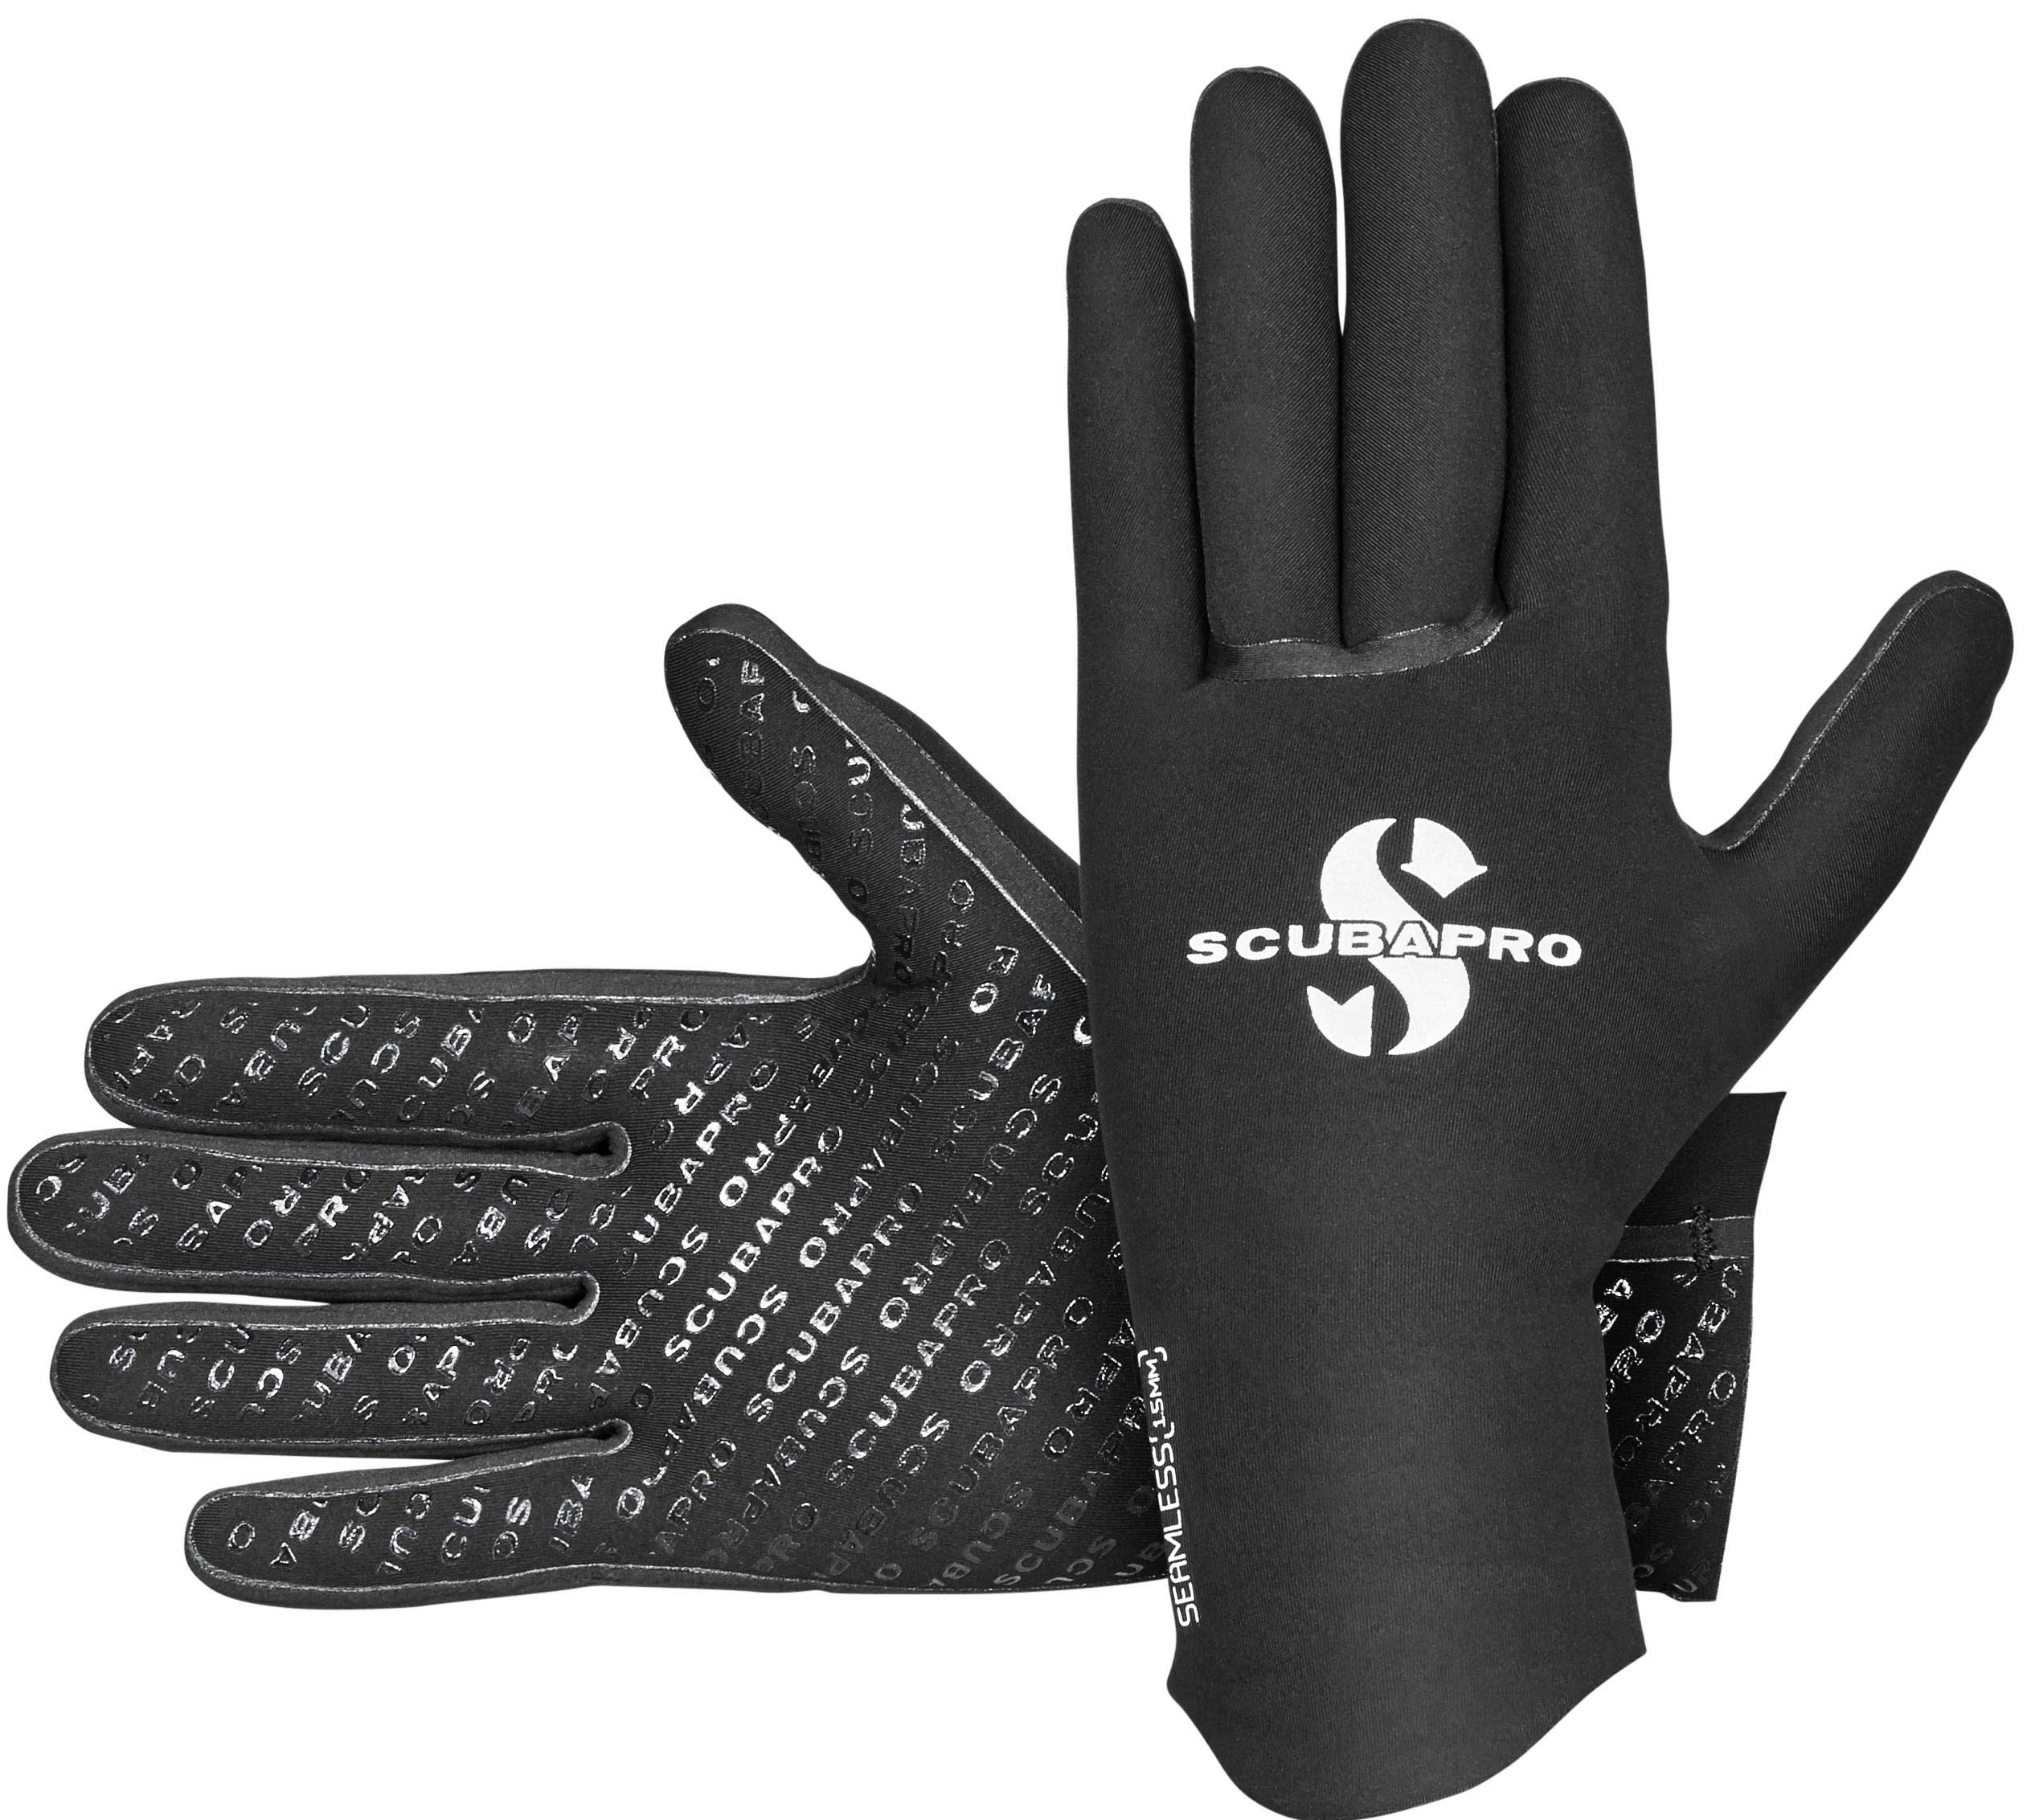 Водолазни безшевни неопренови ръкавици SEAMLESS 1.5 / 1,5 мм – Scubapro